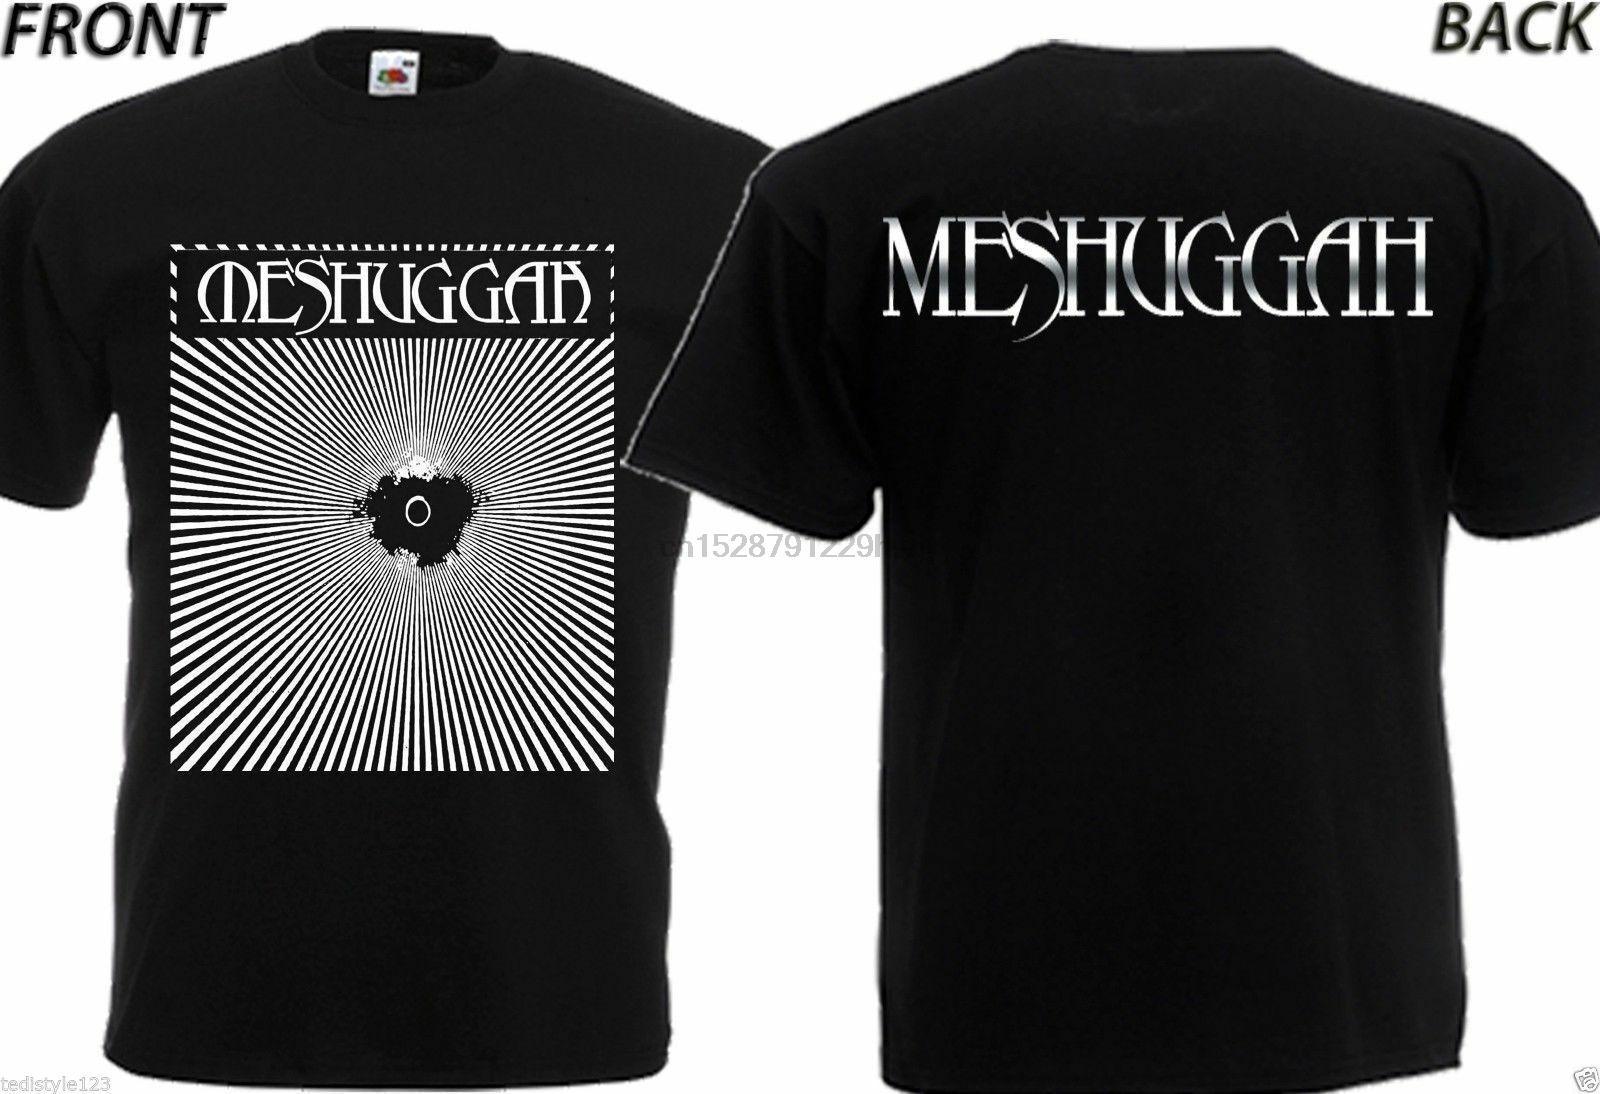 New Dtg Druck T T-Shirt Meshuggah -SMLXlXxl3Xl4Xl5X